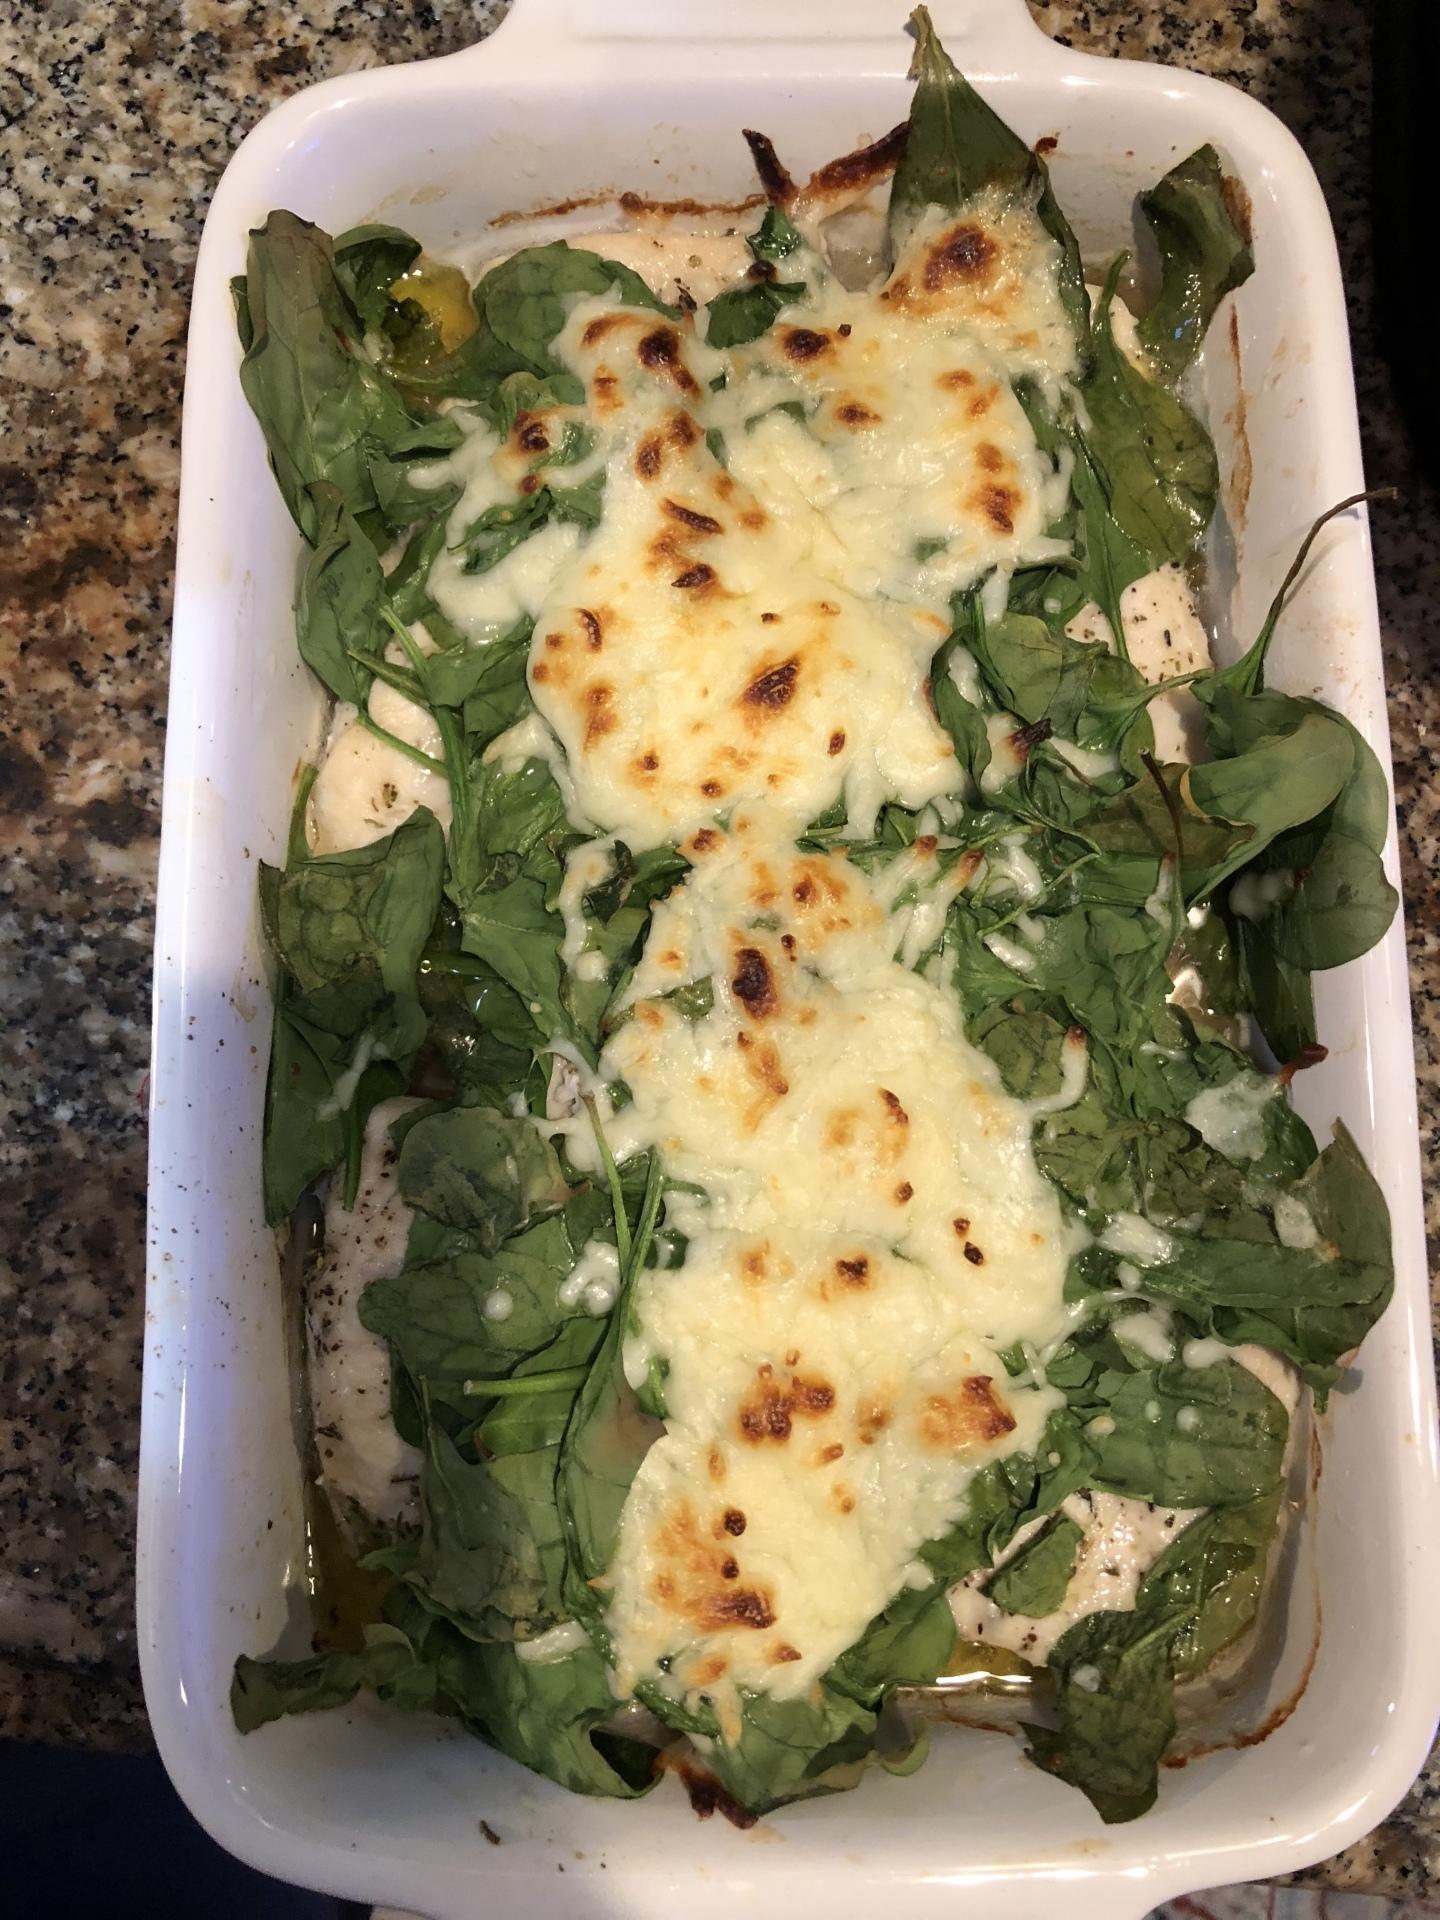 Spinach and Chicken Bake